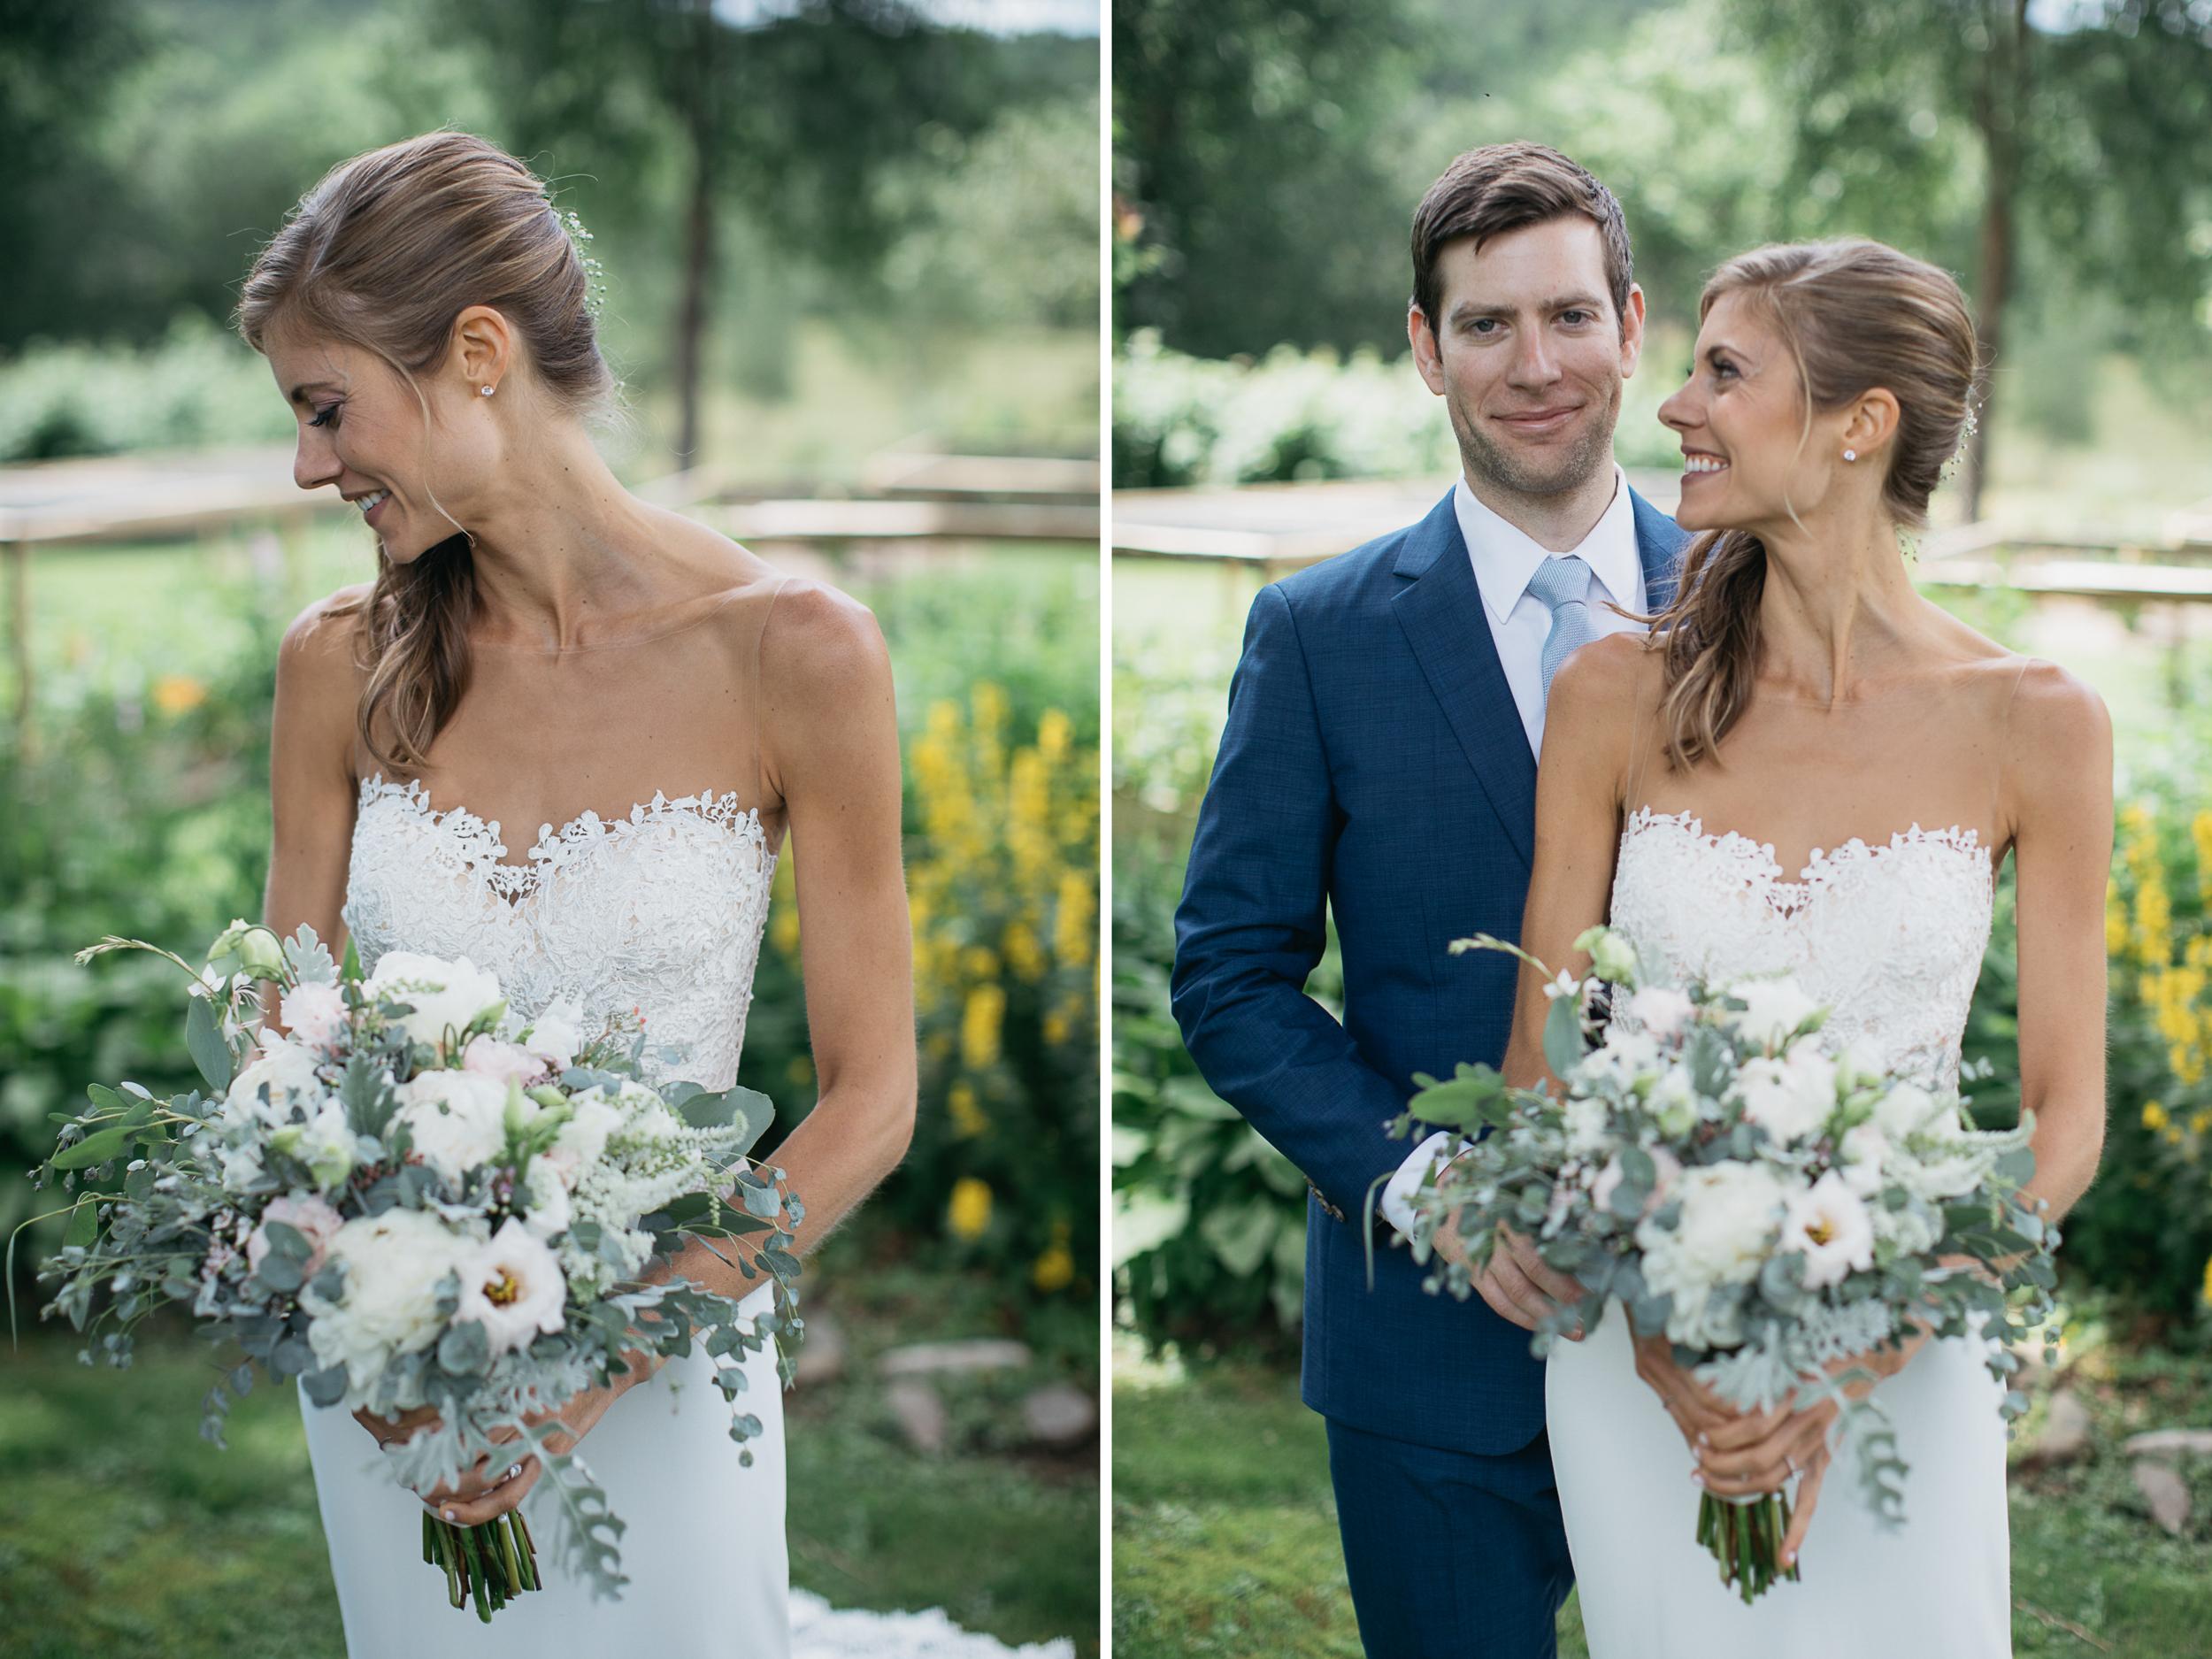 Karen_Alex_Bliss_ridge_farm_Vermont_wedding008.jpg